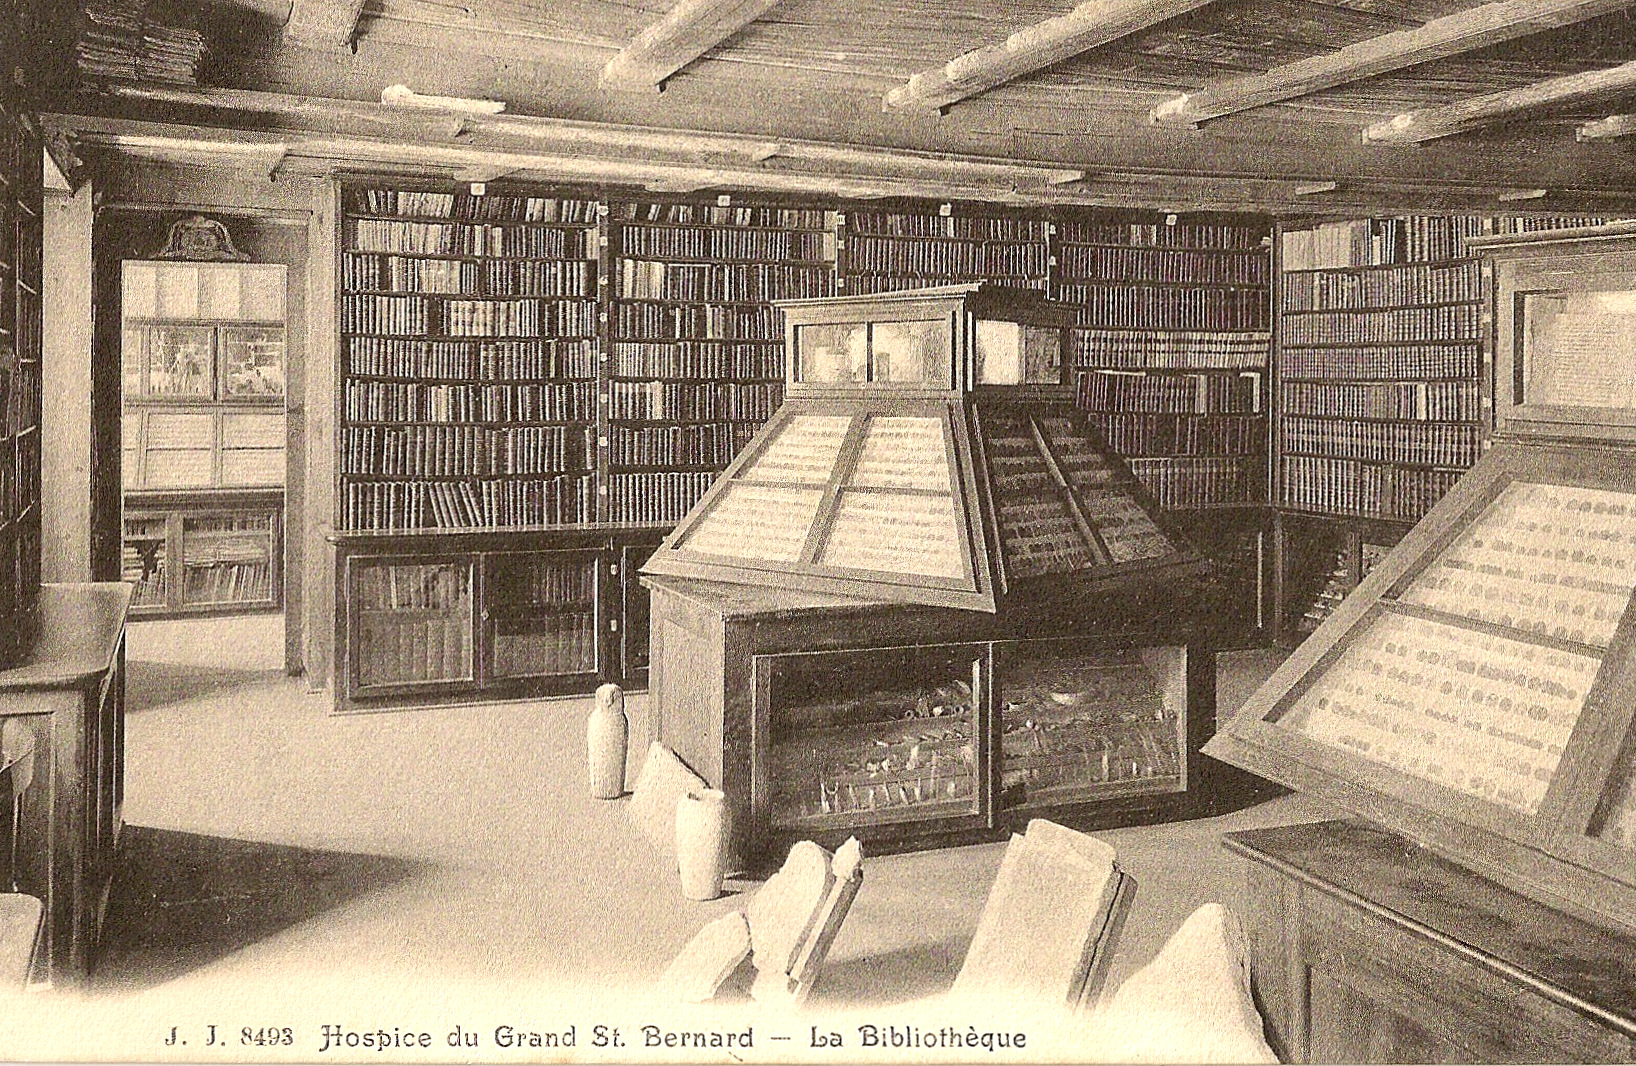 La Bibliothèque - Hospice du Grand-Saint-Bernard